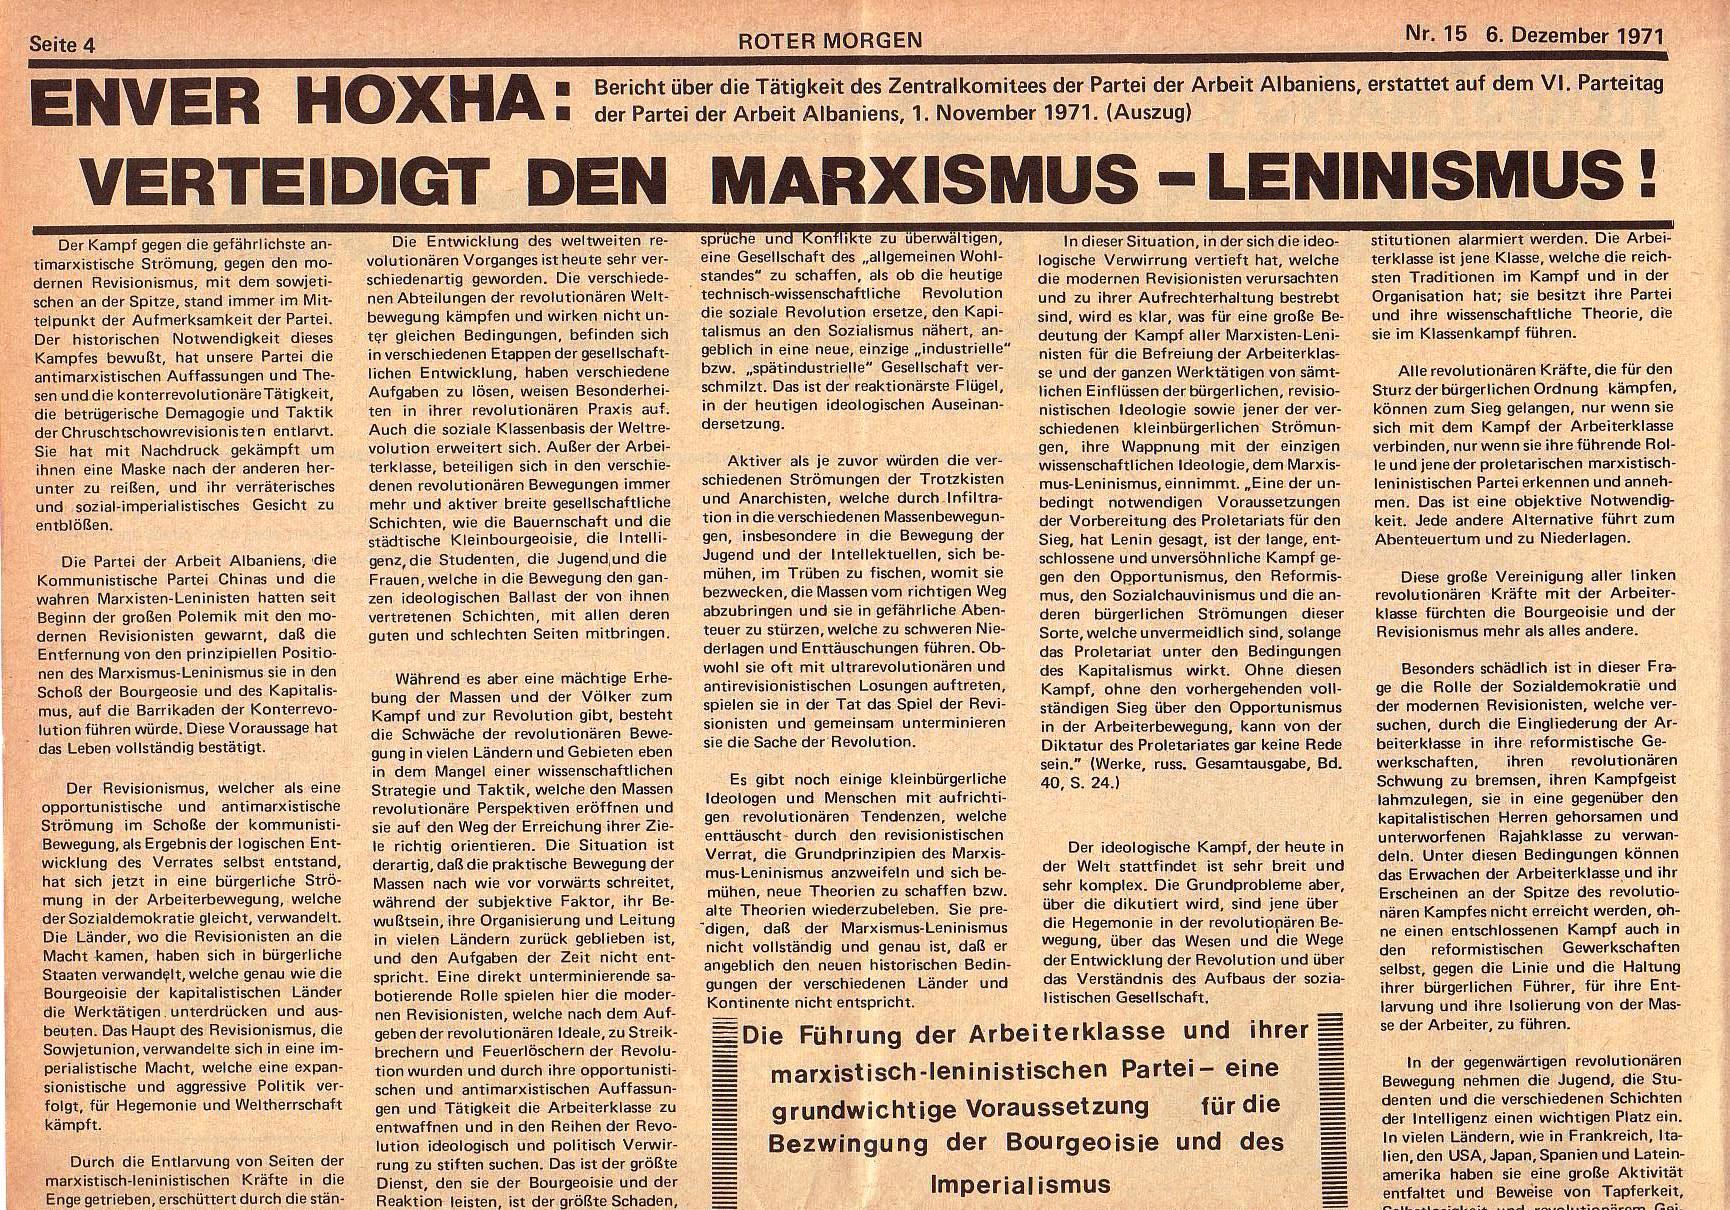 Roter Morgen, 5. Jg., 6. Dezember 1971, Nr. 15, Seite 4a